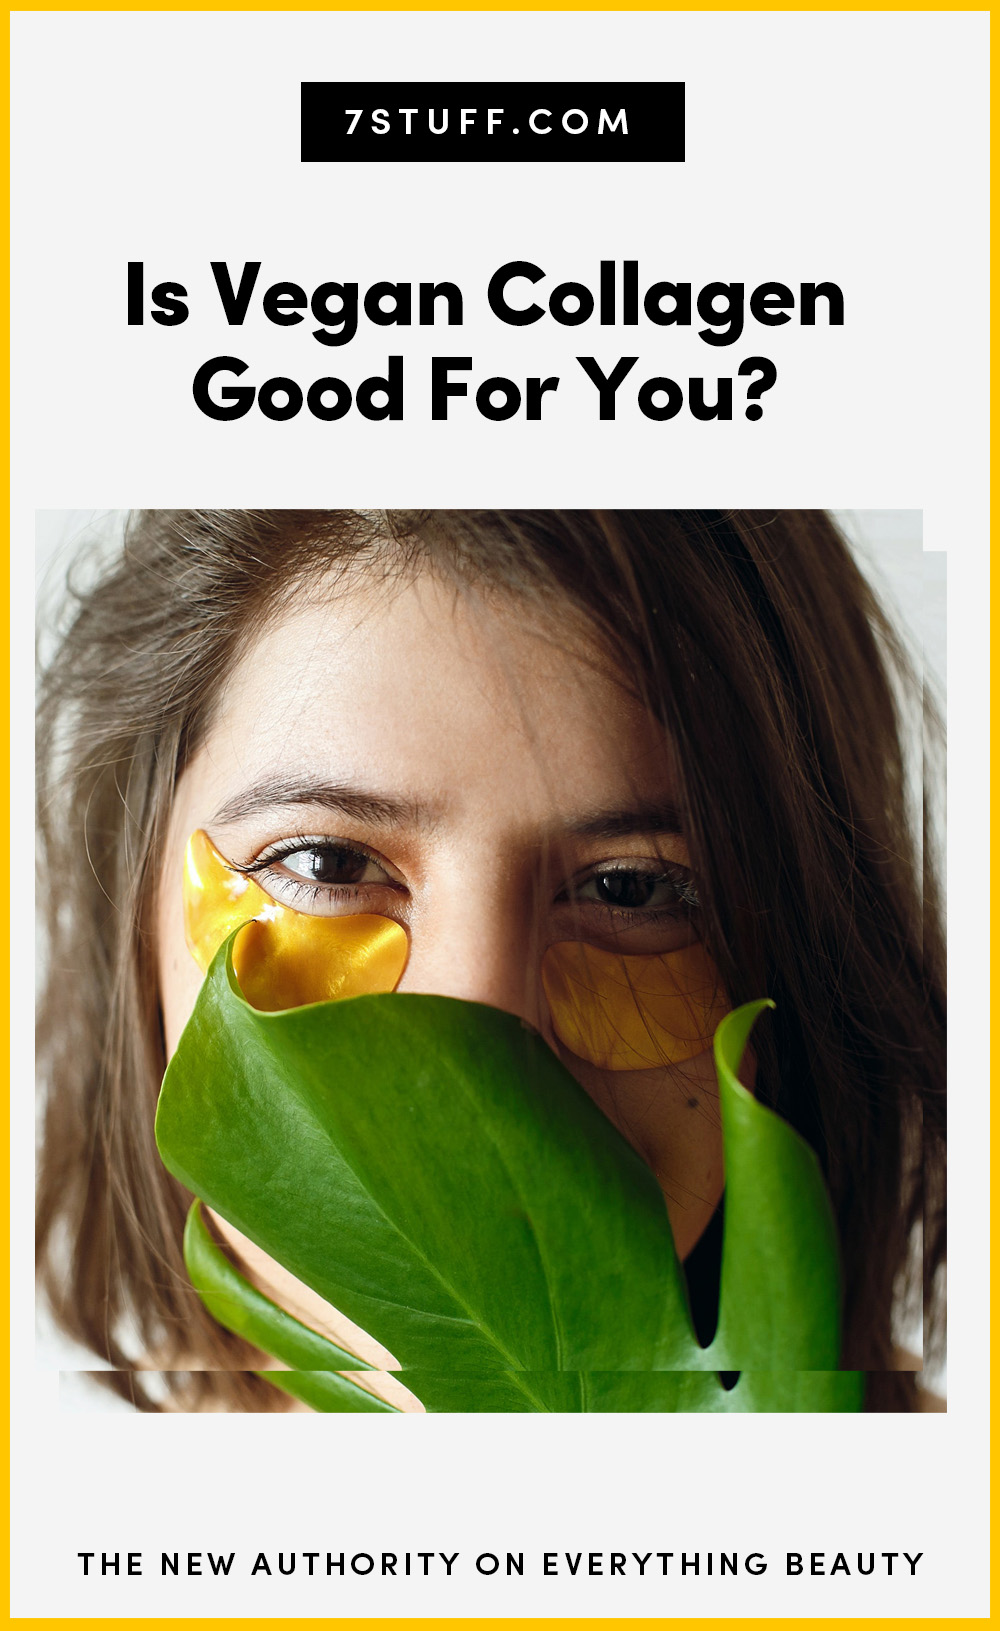 Is Vegan Collagen Good For You?